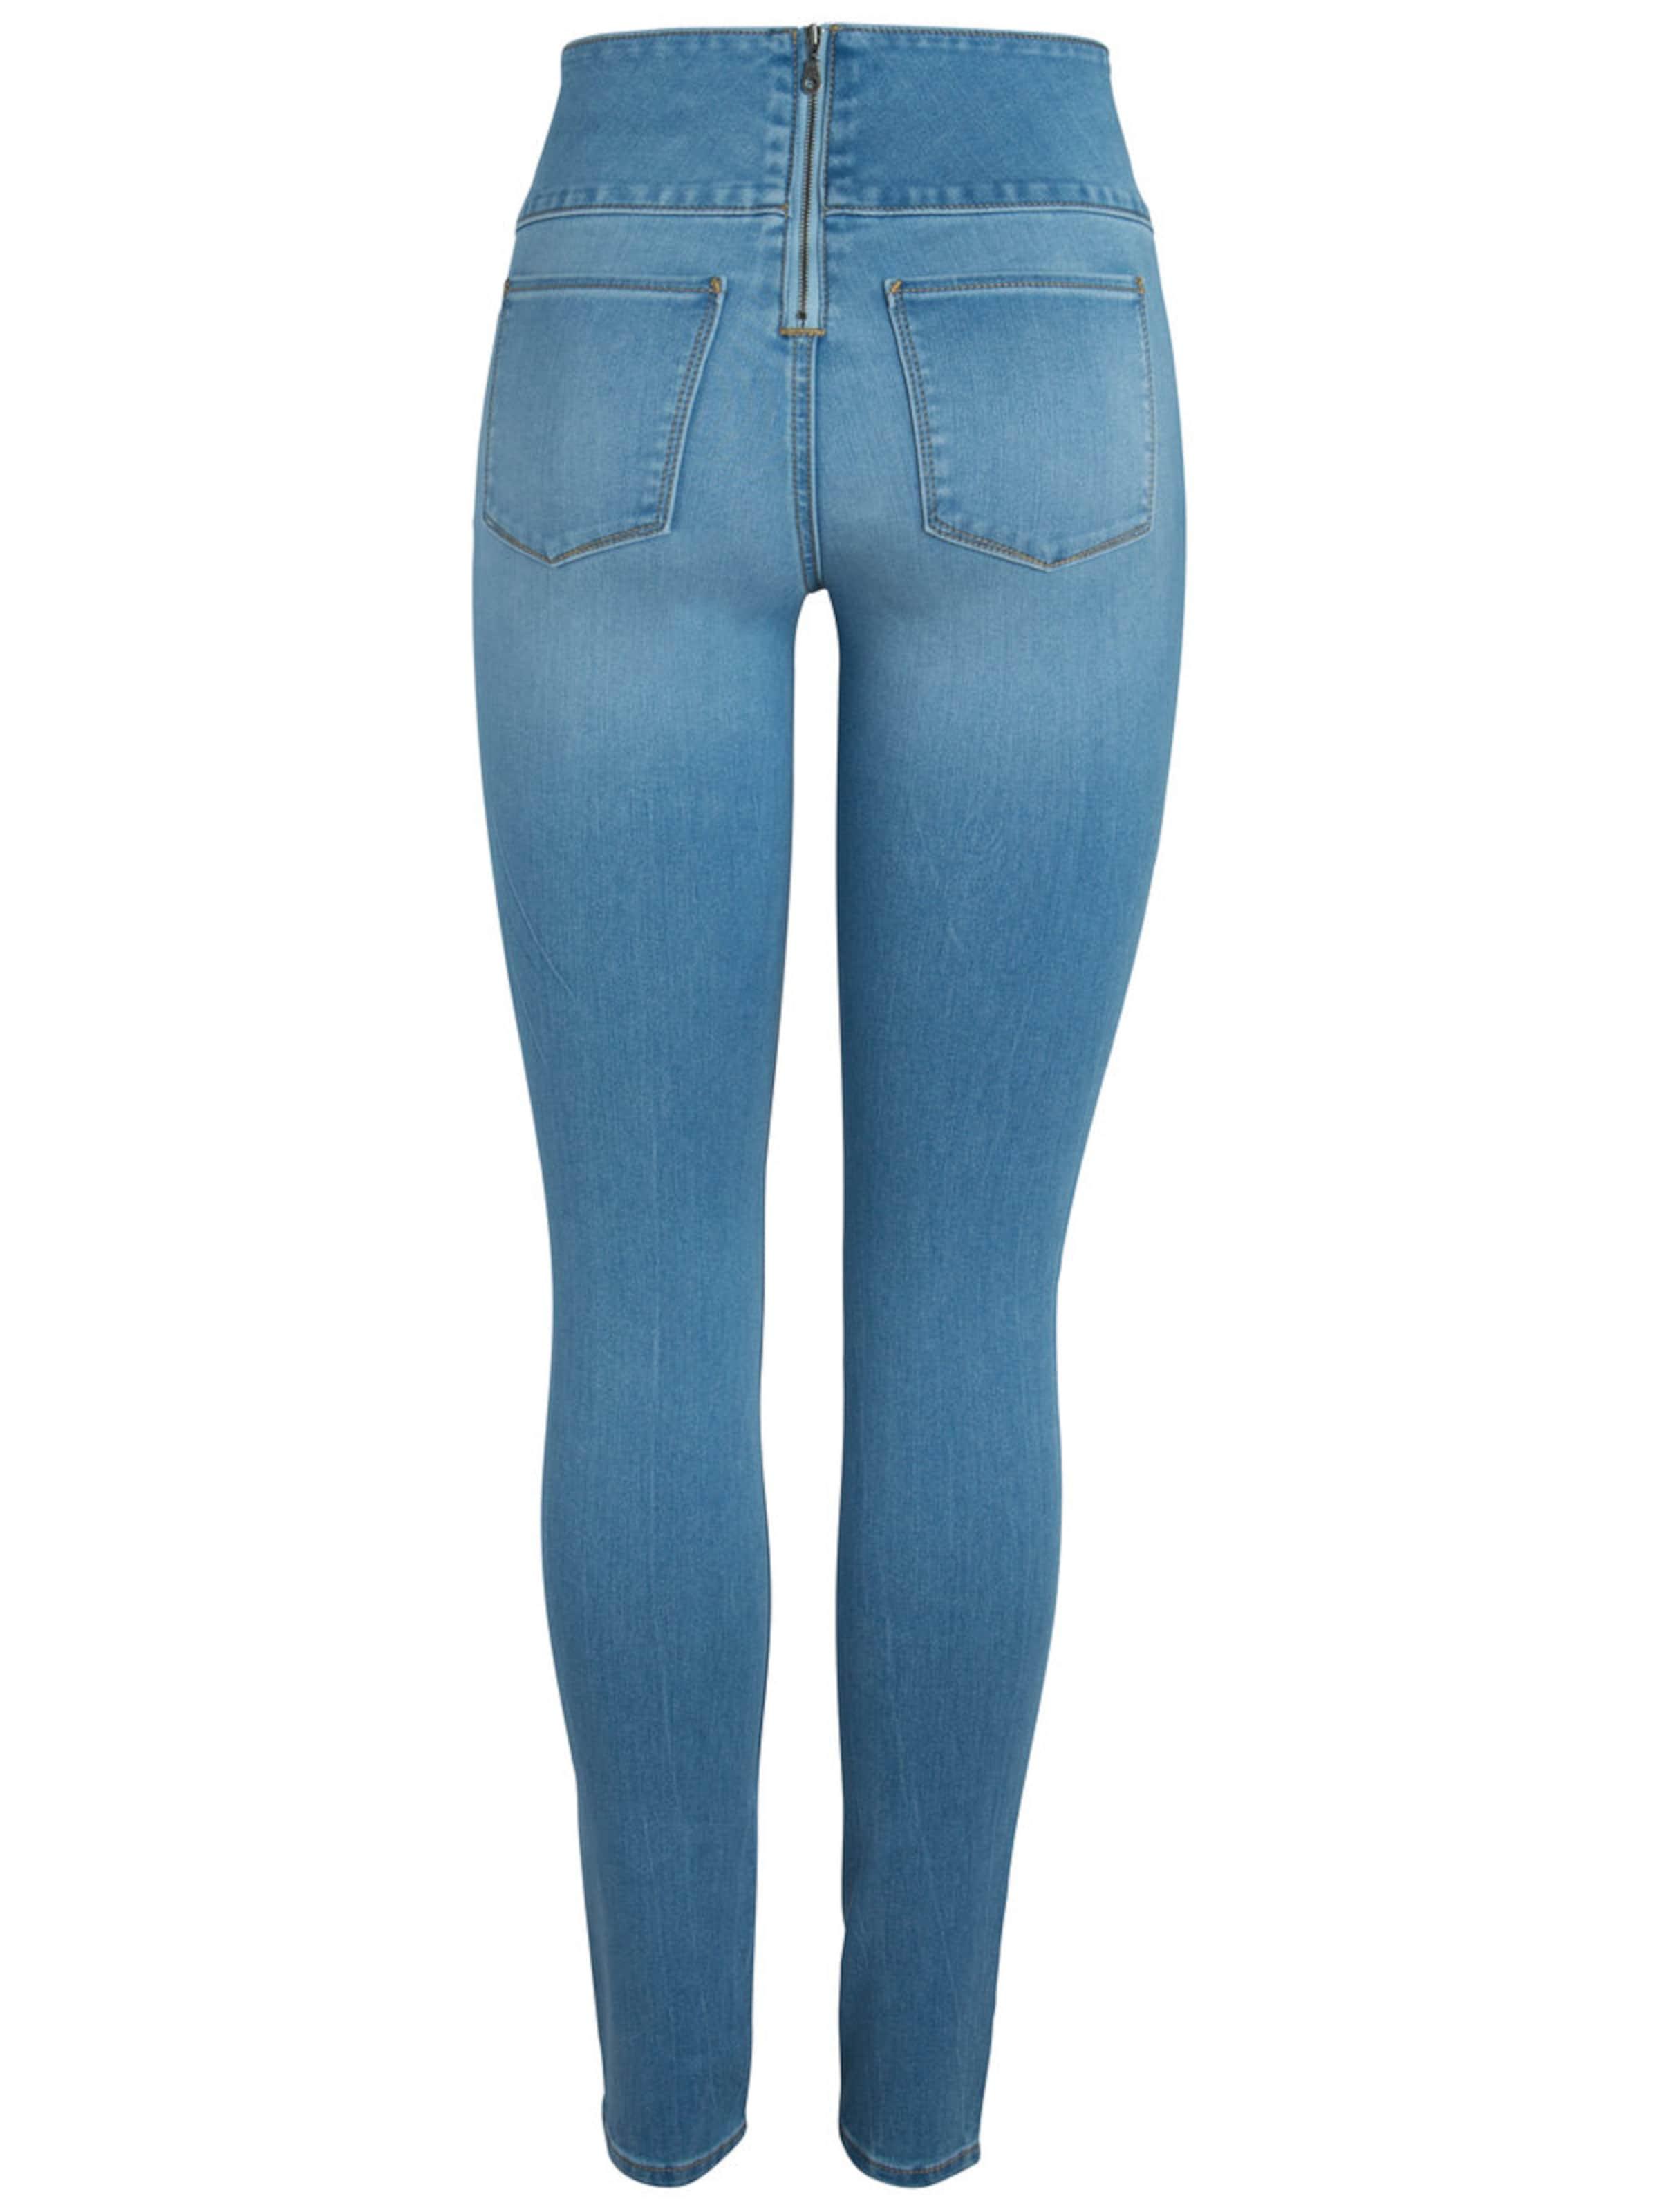 PIECES Jeans Verkauf Offizielle Bester Lieferant Q2YES